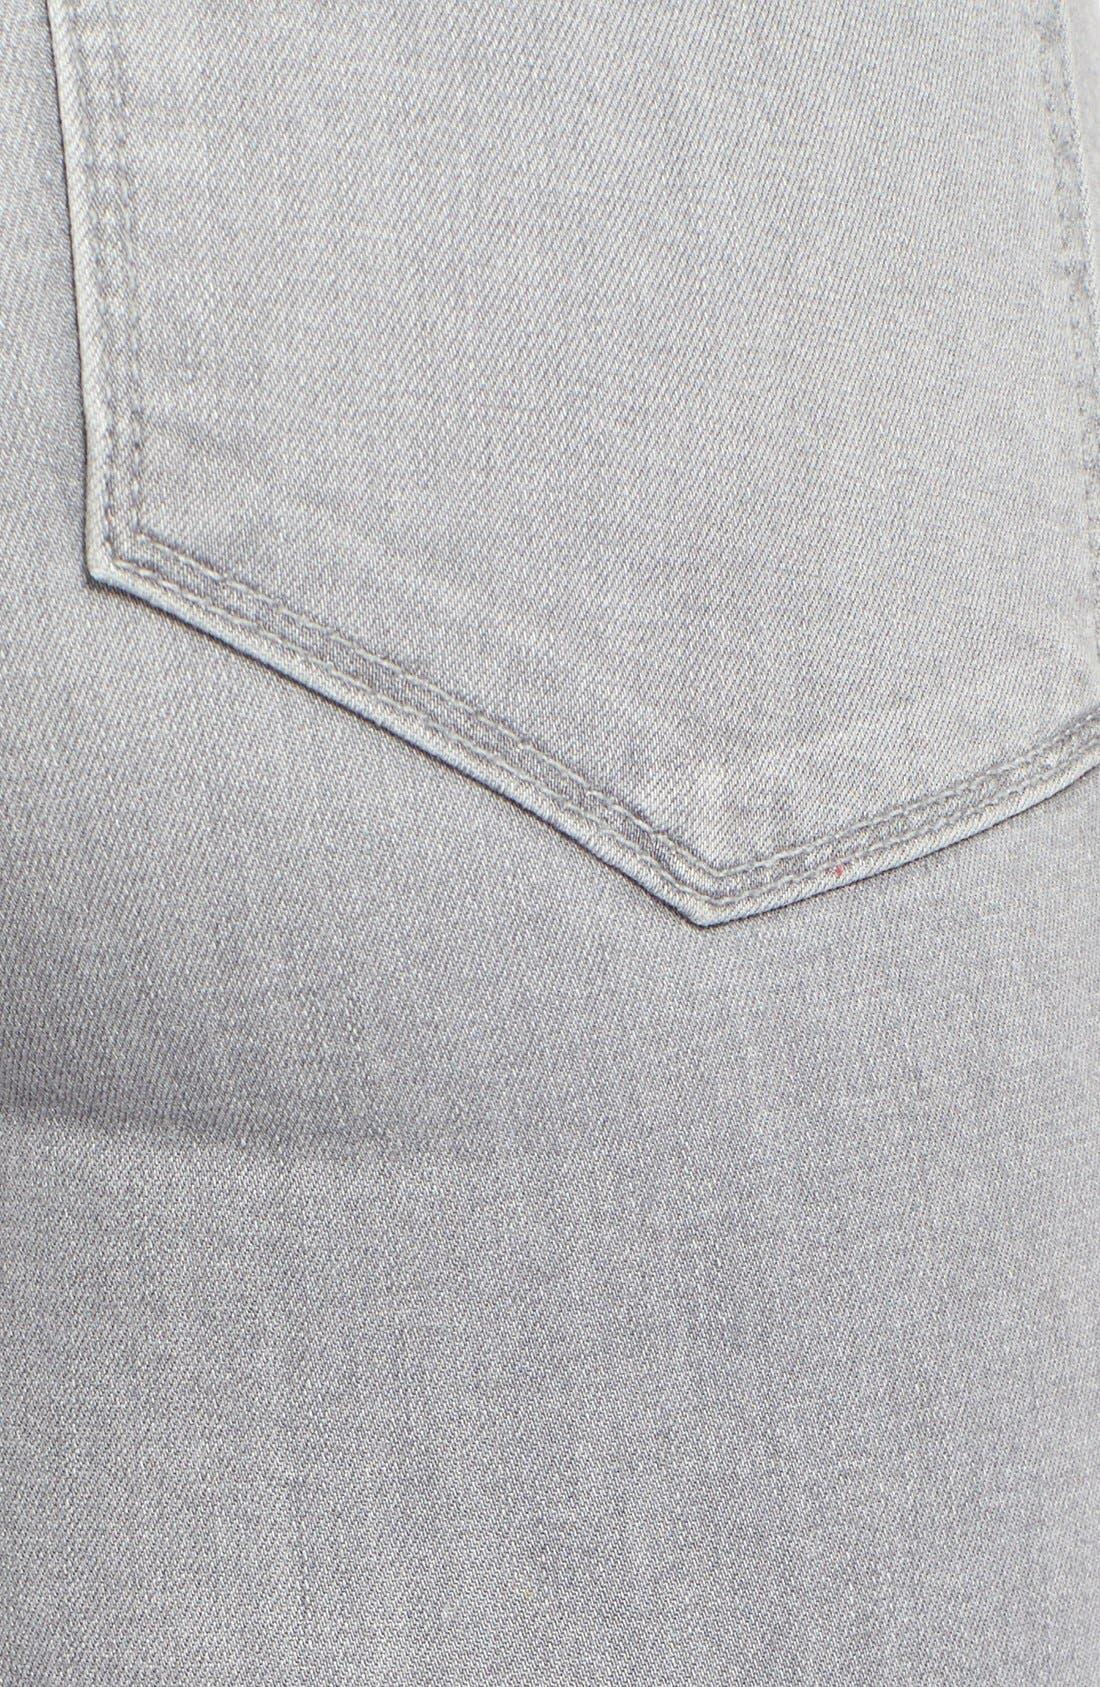 Alternate Image 6  - Paige Denim 'Verdugo' Ankle Skinny Jeans (Dove Grey)